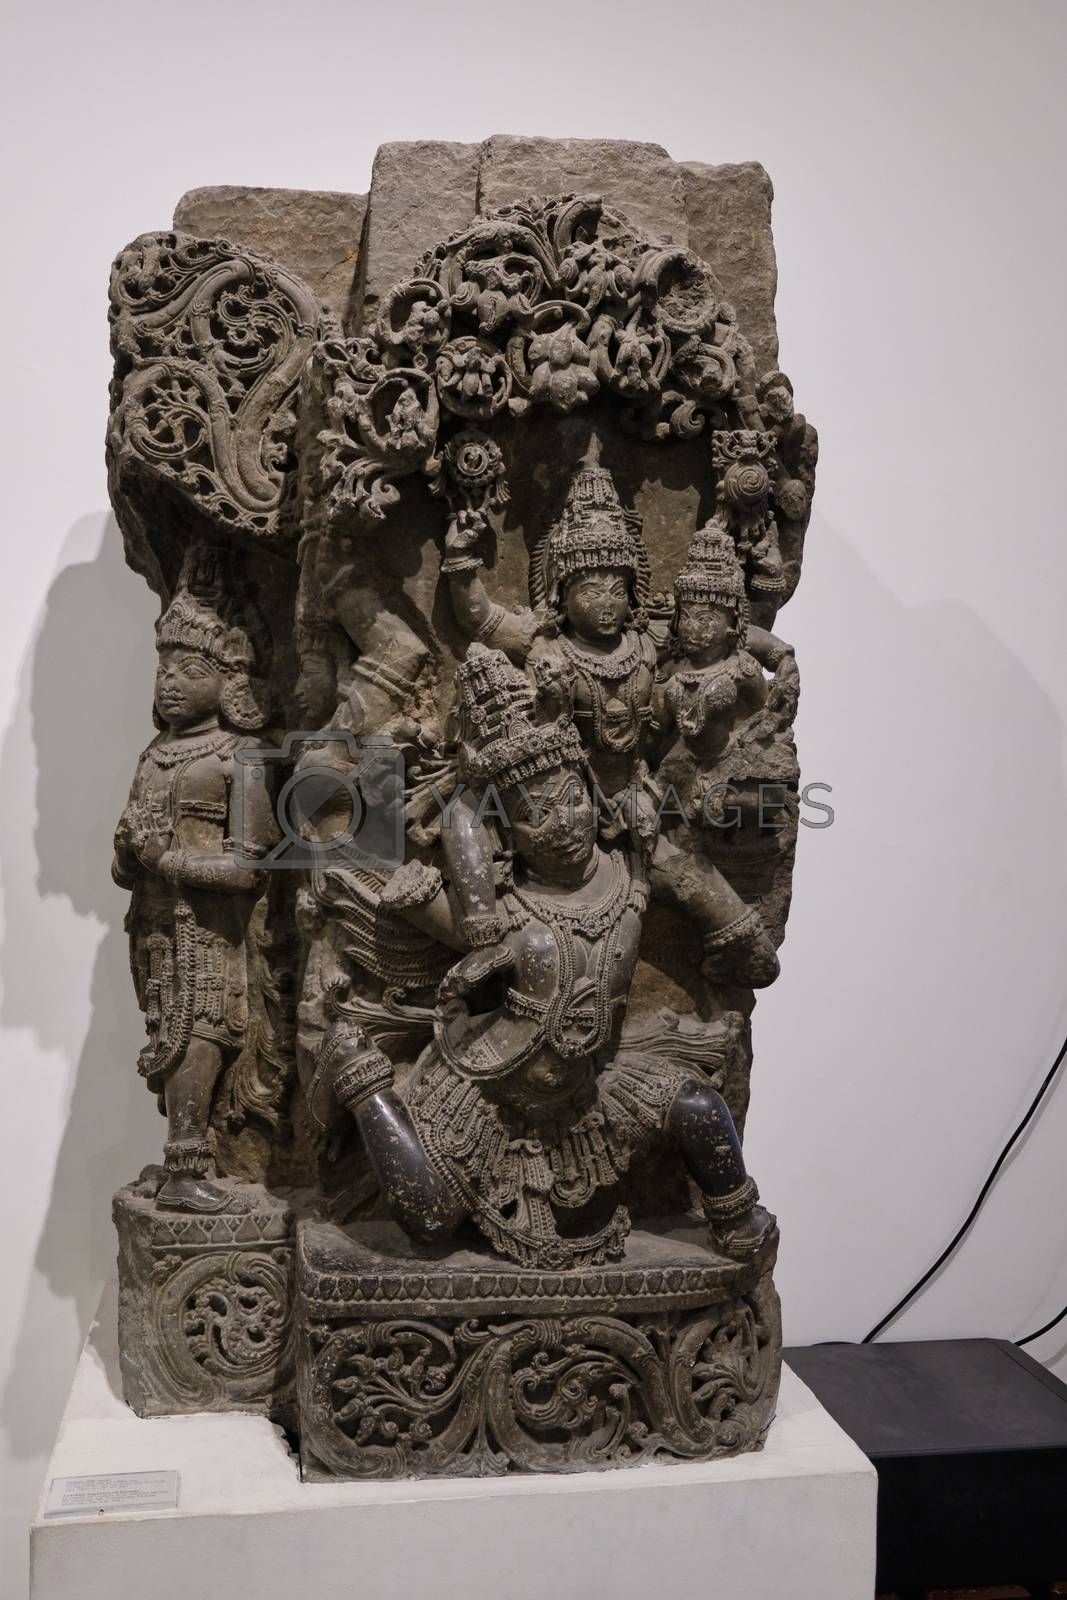 New Delhi / India - September 26, 2019: Stone relief of Hindu deity Lakshmi Narayan, manifestation of Vishnu, in the National Museum of India in New Delhi